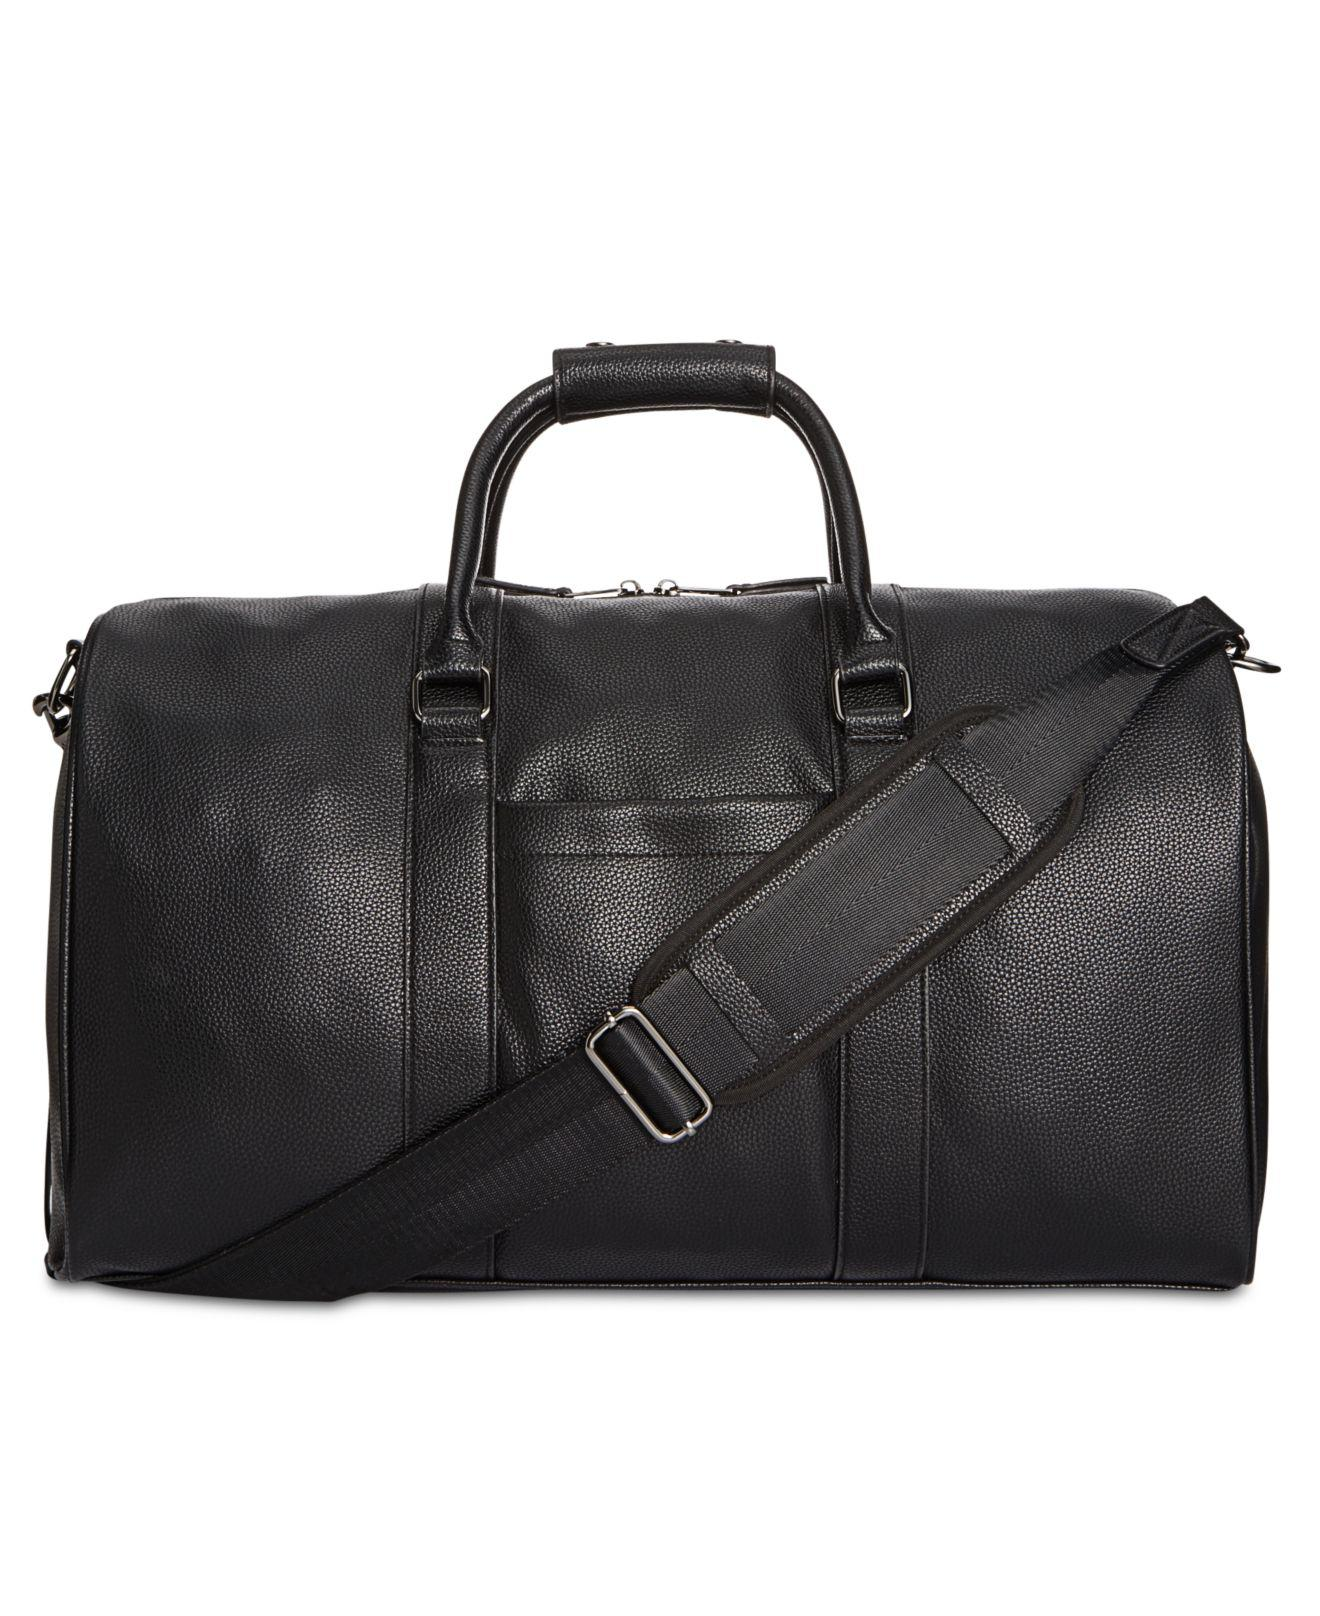 c7bdf44ffb67 Lyst - Steve Madden Men s Duffel Bag in Black for Men